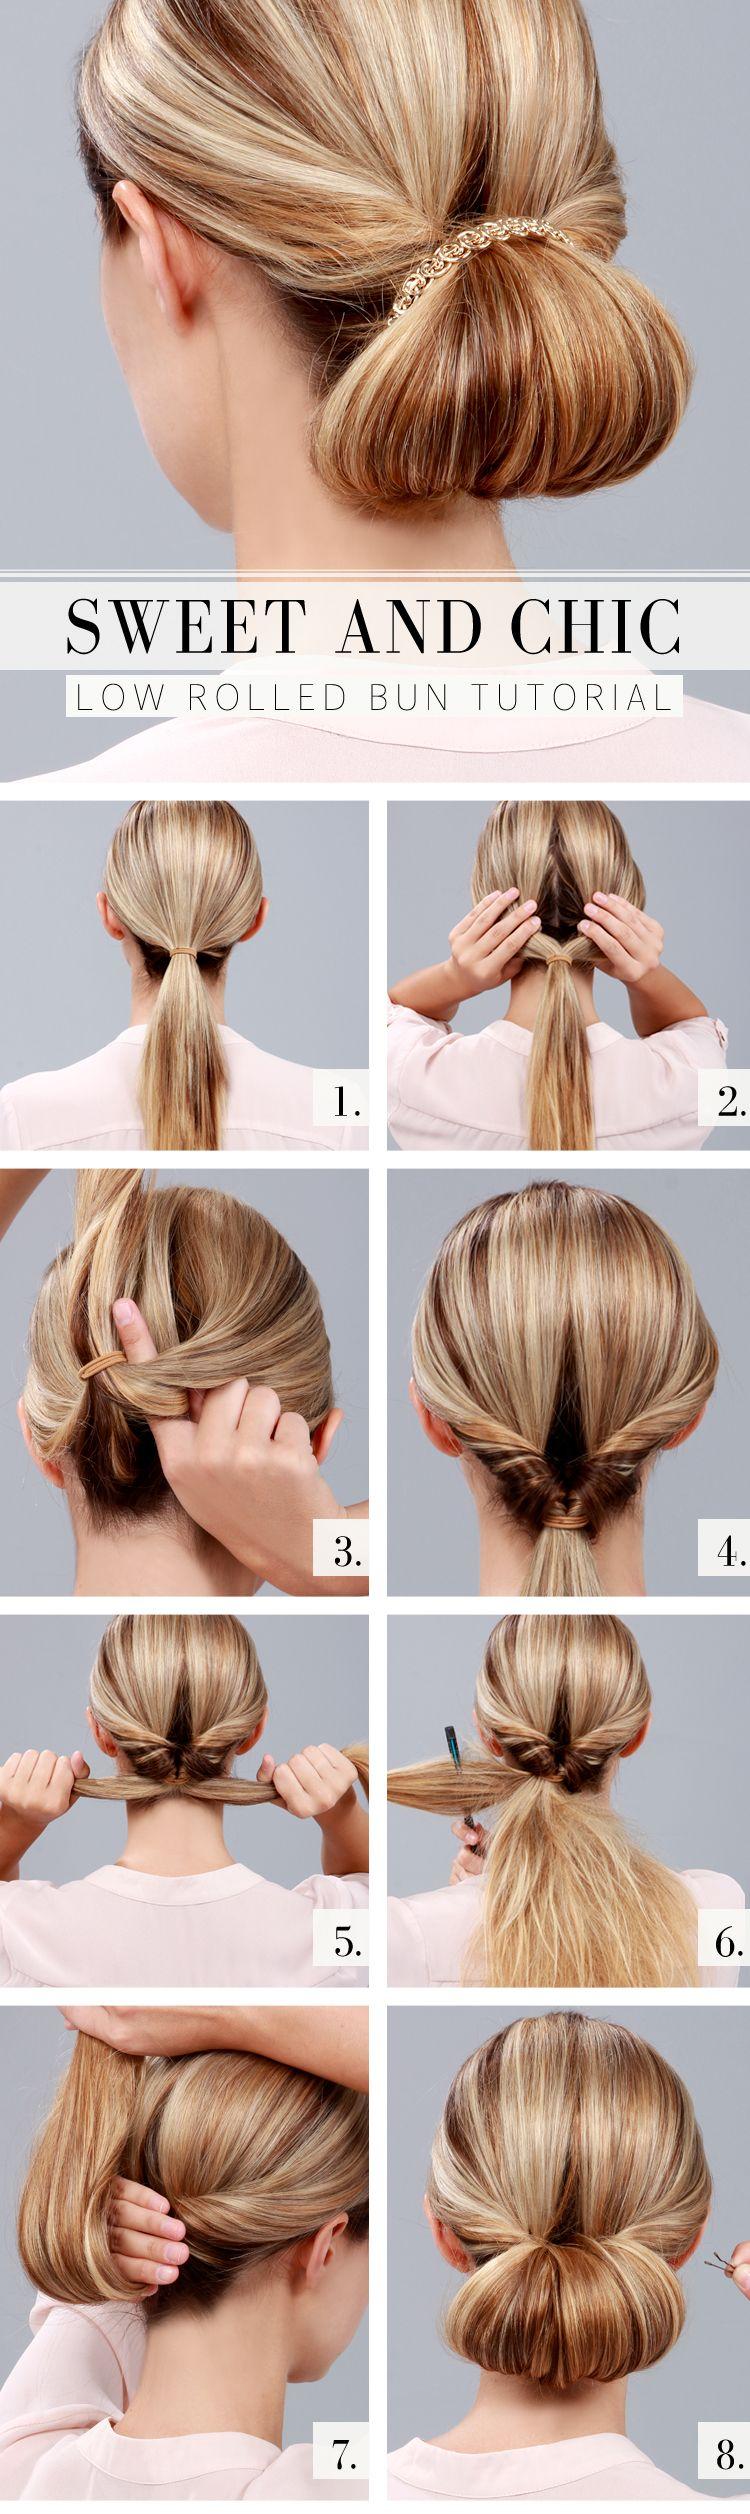 Top hairstyle tutorials for summer bun tutorials bun hair